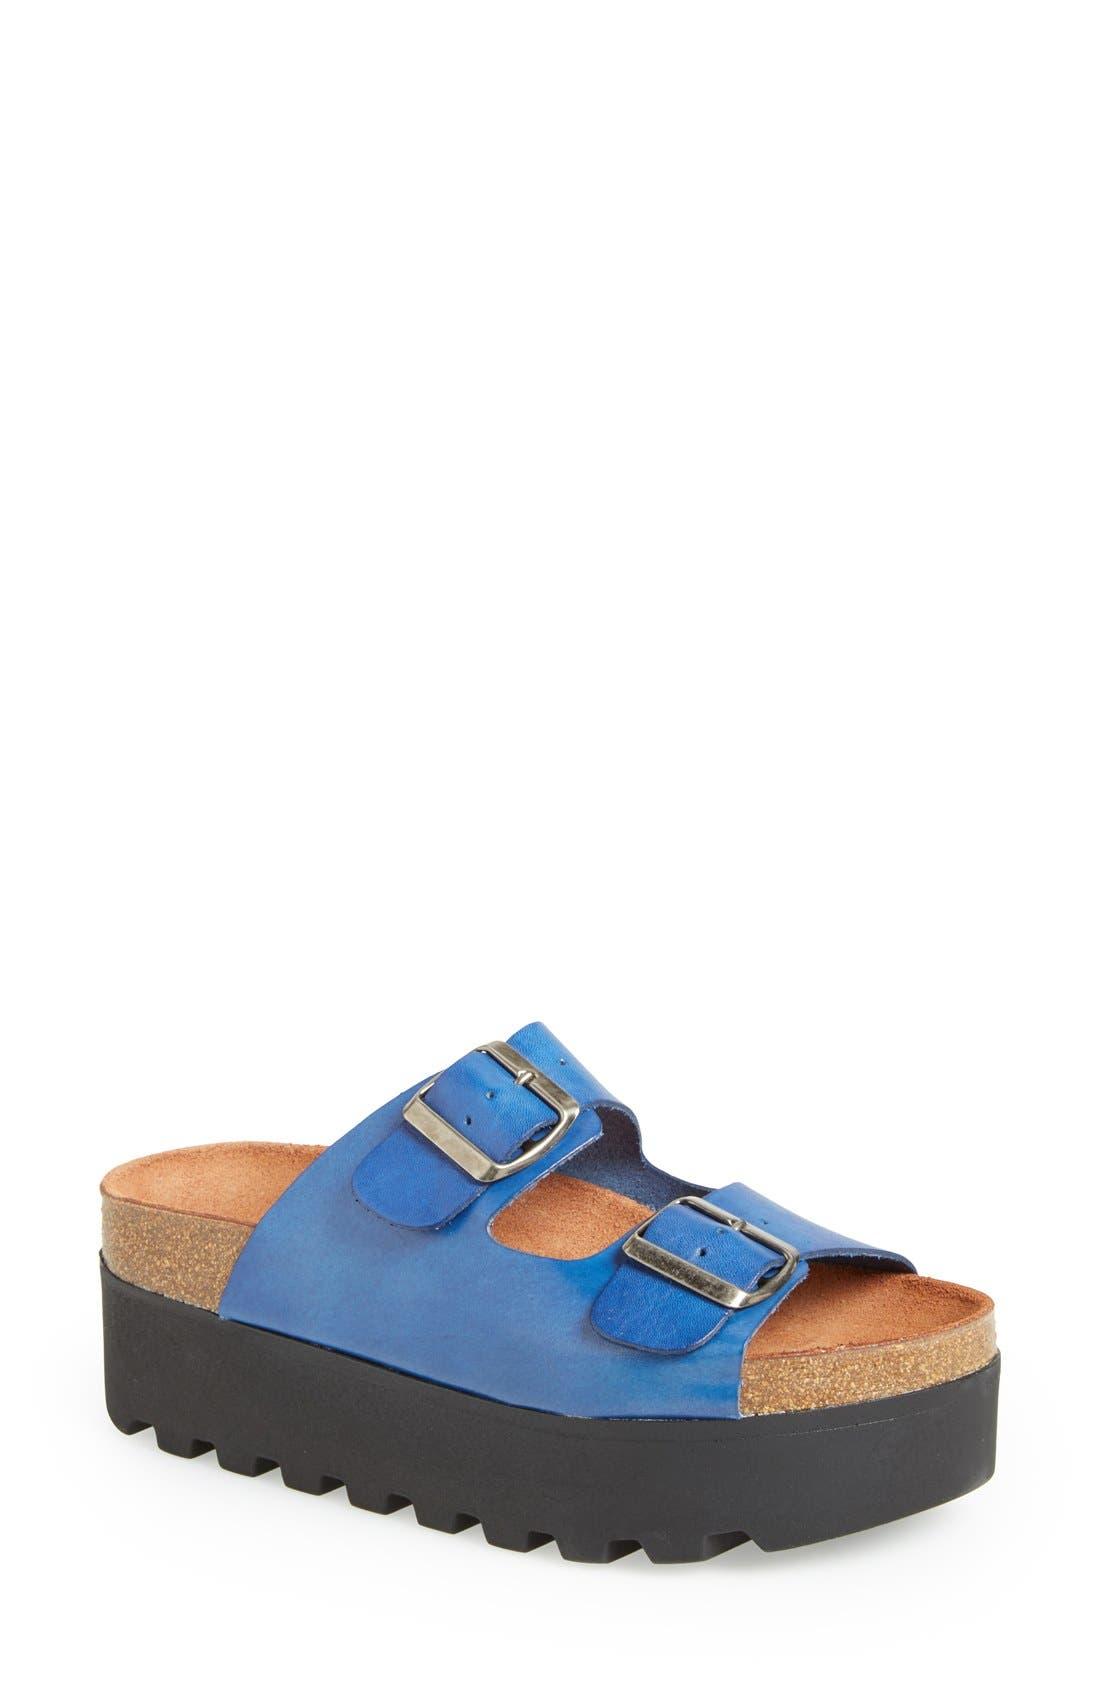 Main Image - SIXTYSEVEN 'Lisa' Leather Platform Sandal (Women)